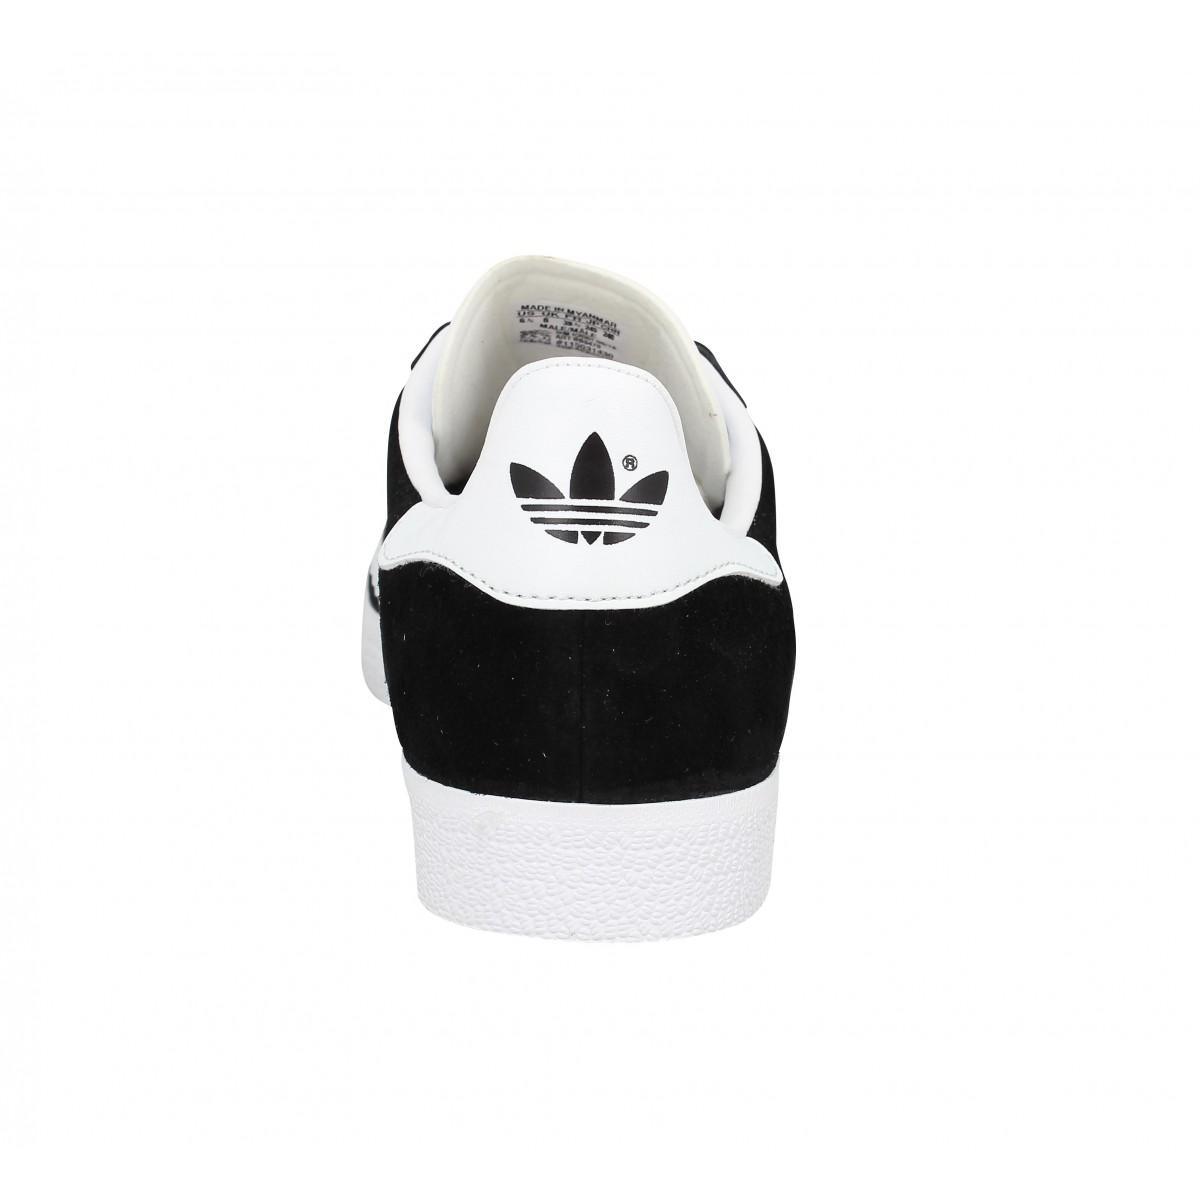 huge selection of 714da b6724 Baskets ADIDAS Gazelle velours Homme Noir + Blanc. 1